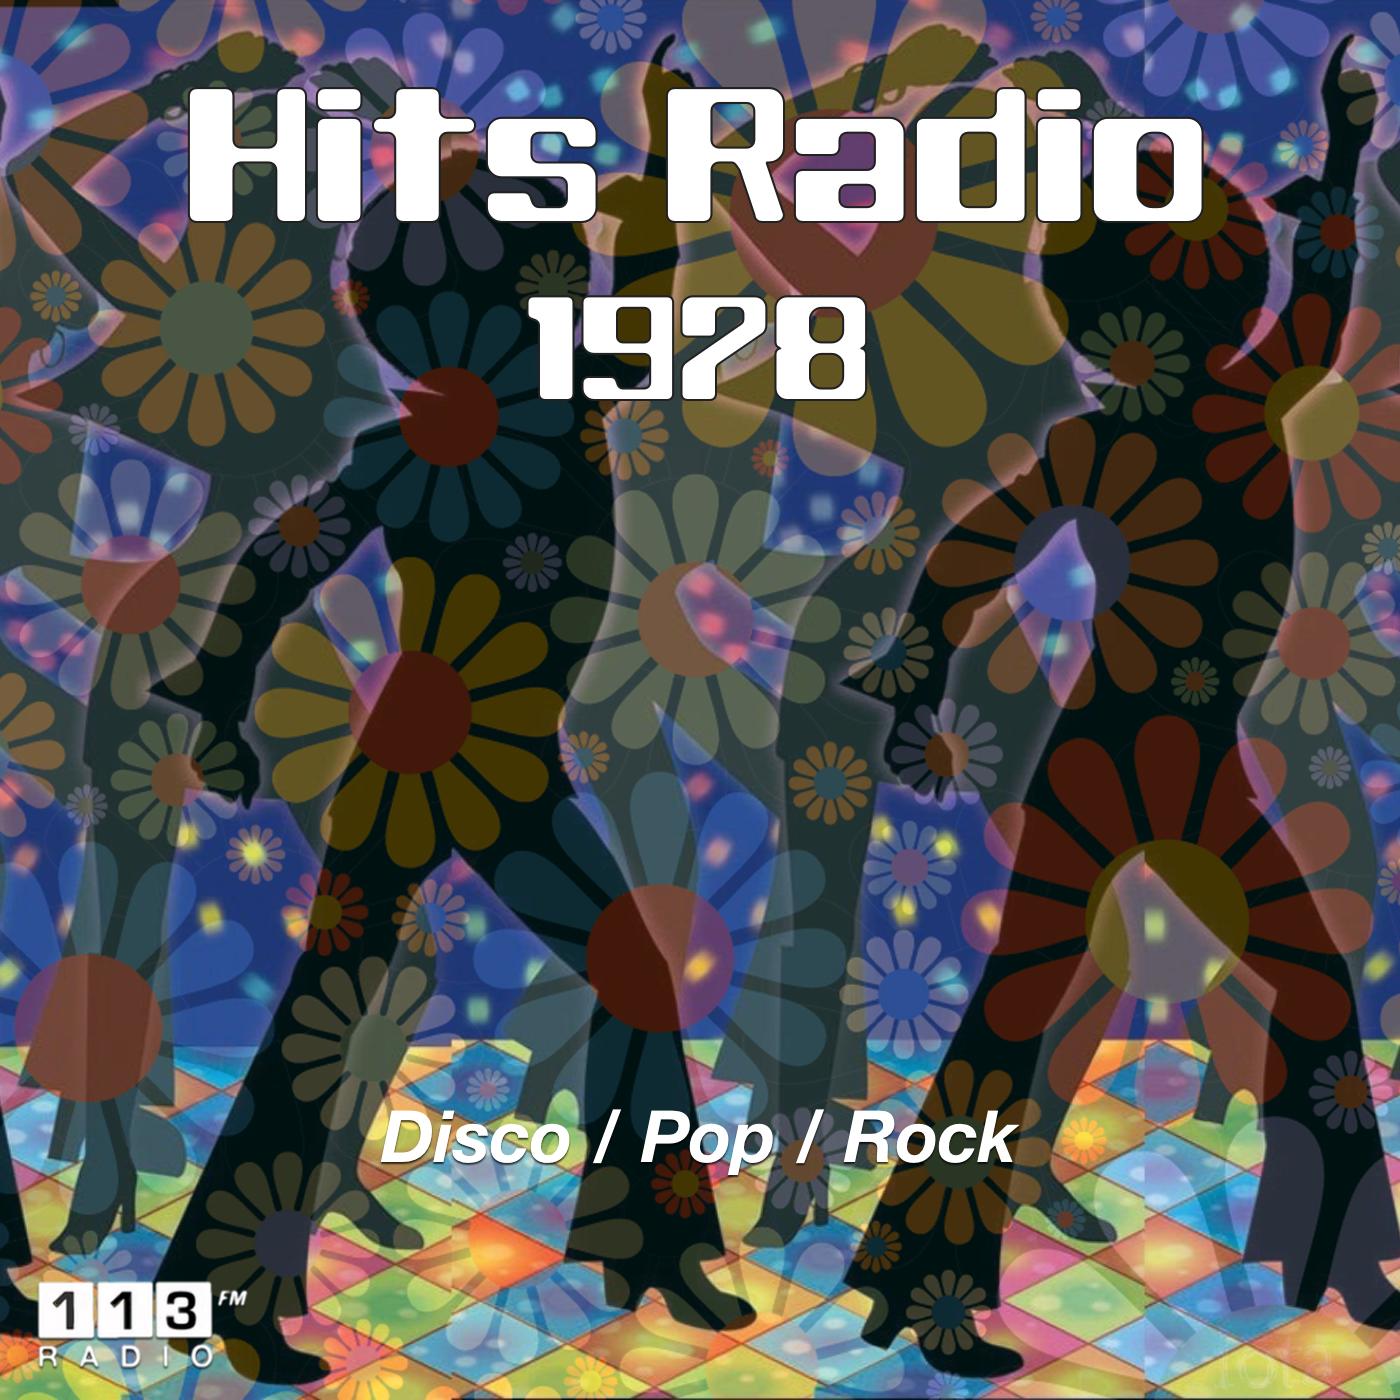 113.fm Hits Radio - 1978